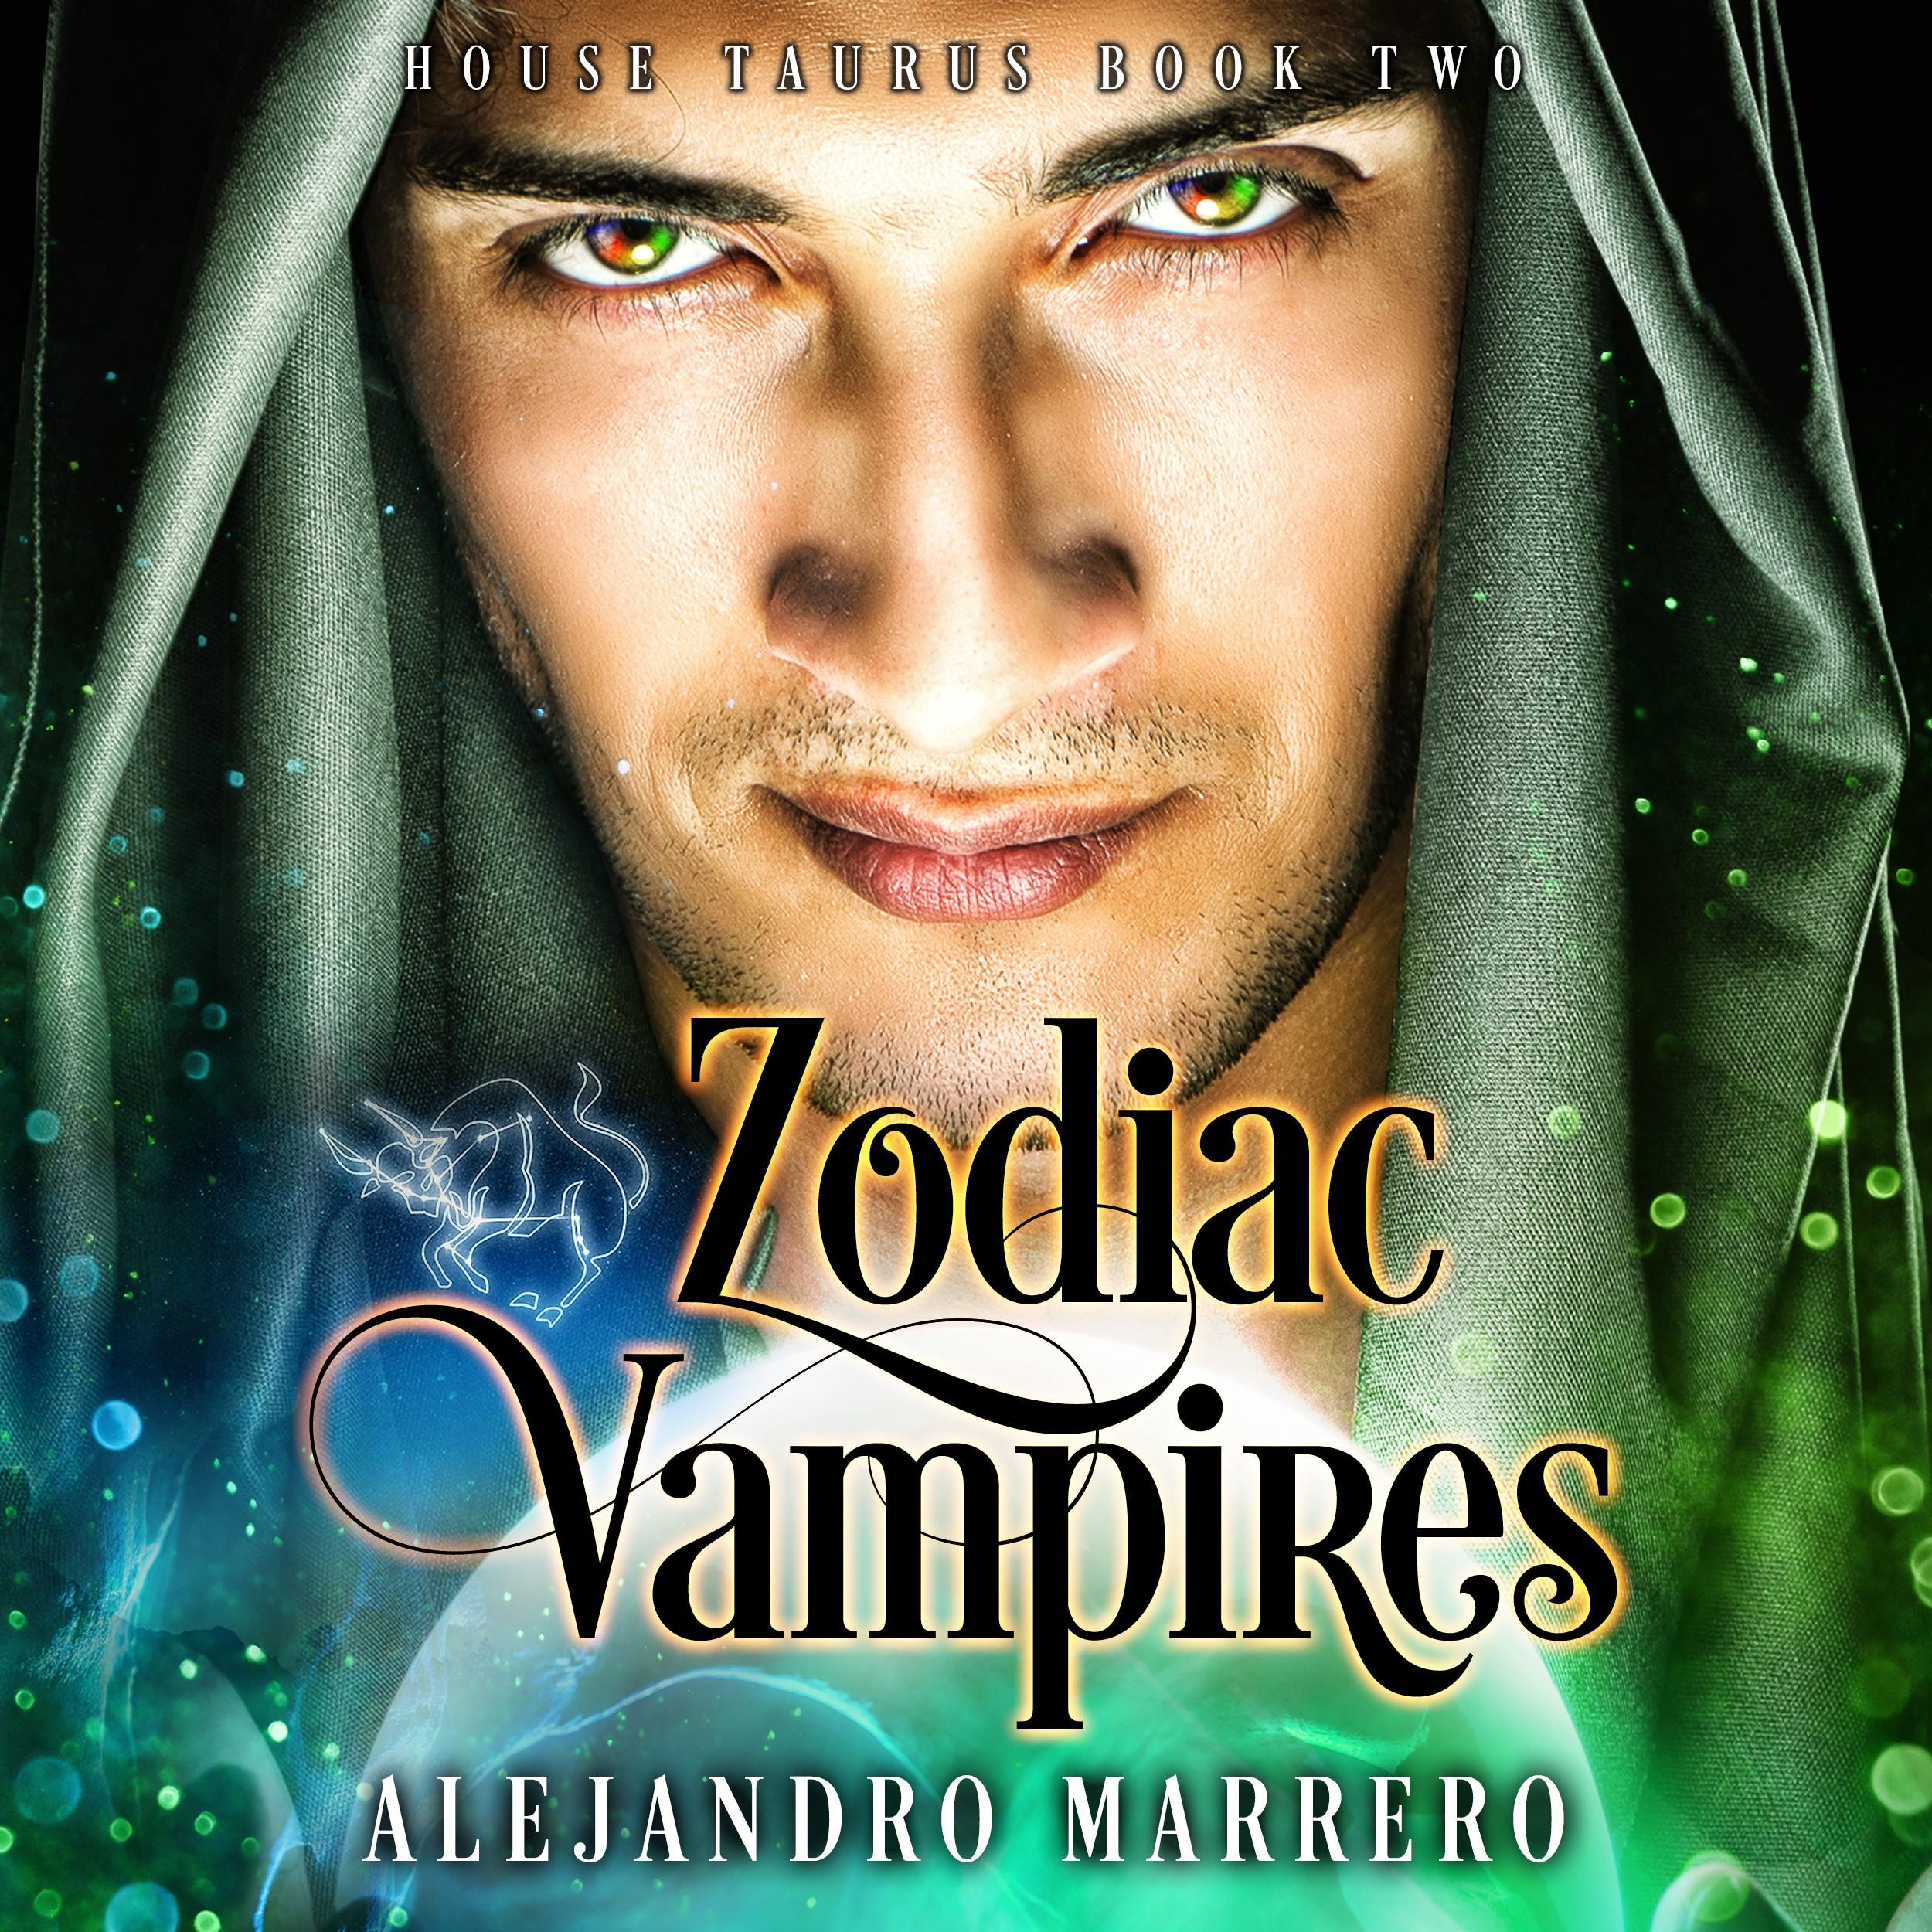 House Taurus - Book Two of Zodiac Vampires